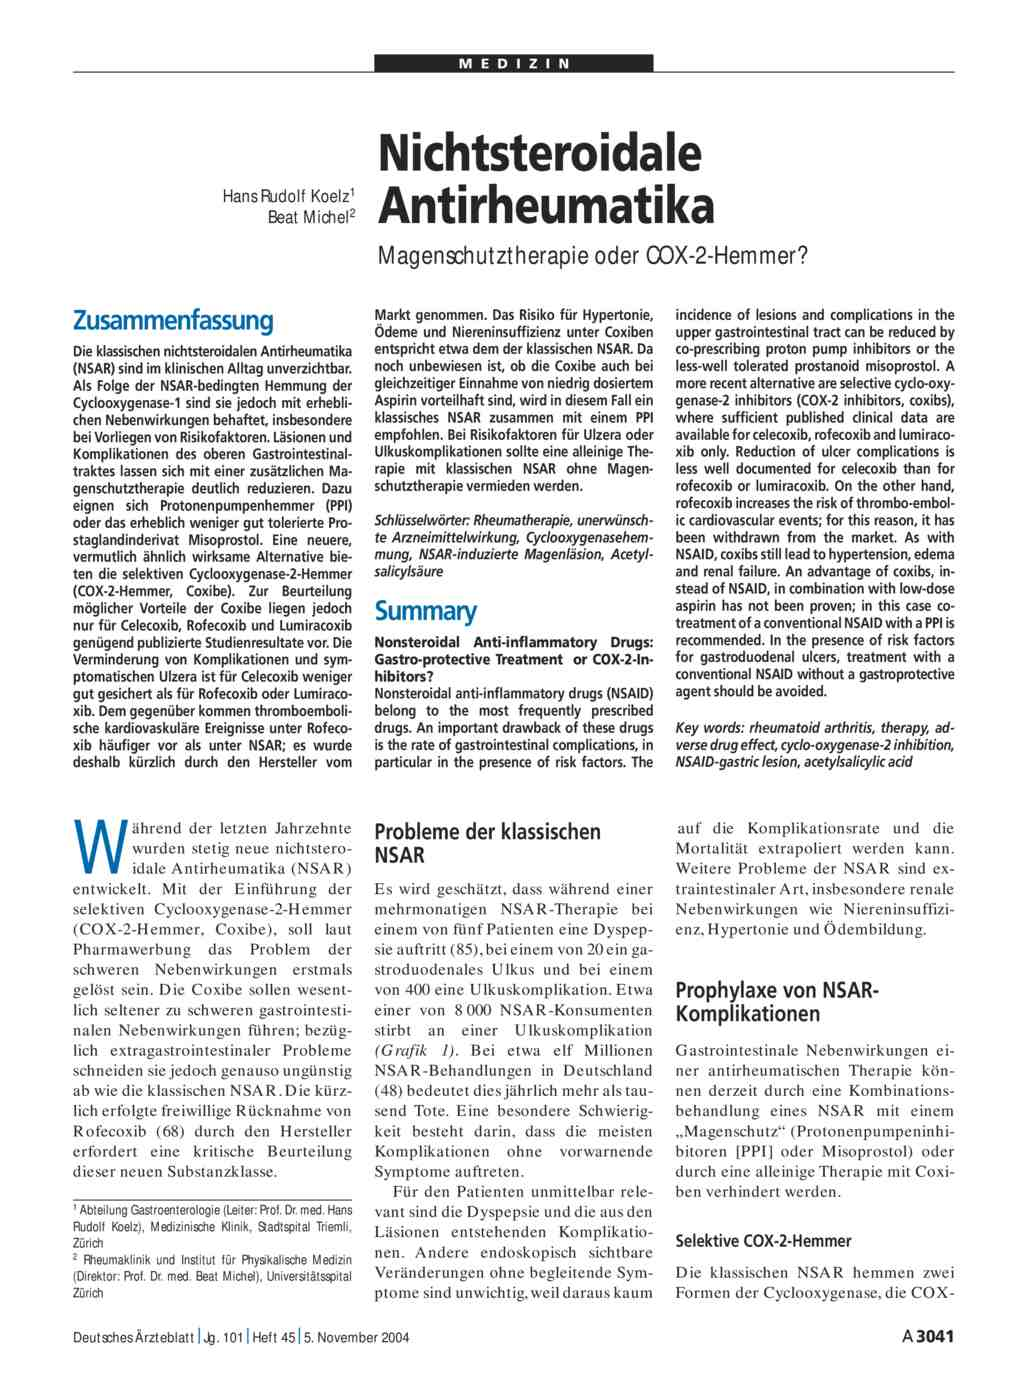 nichtsteroidale antiphlogistika wirkung